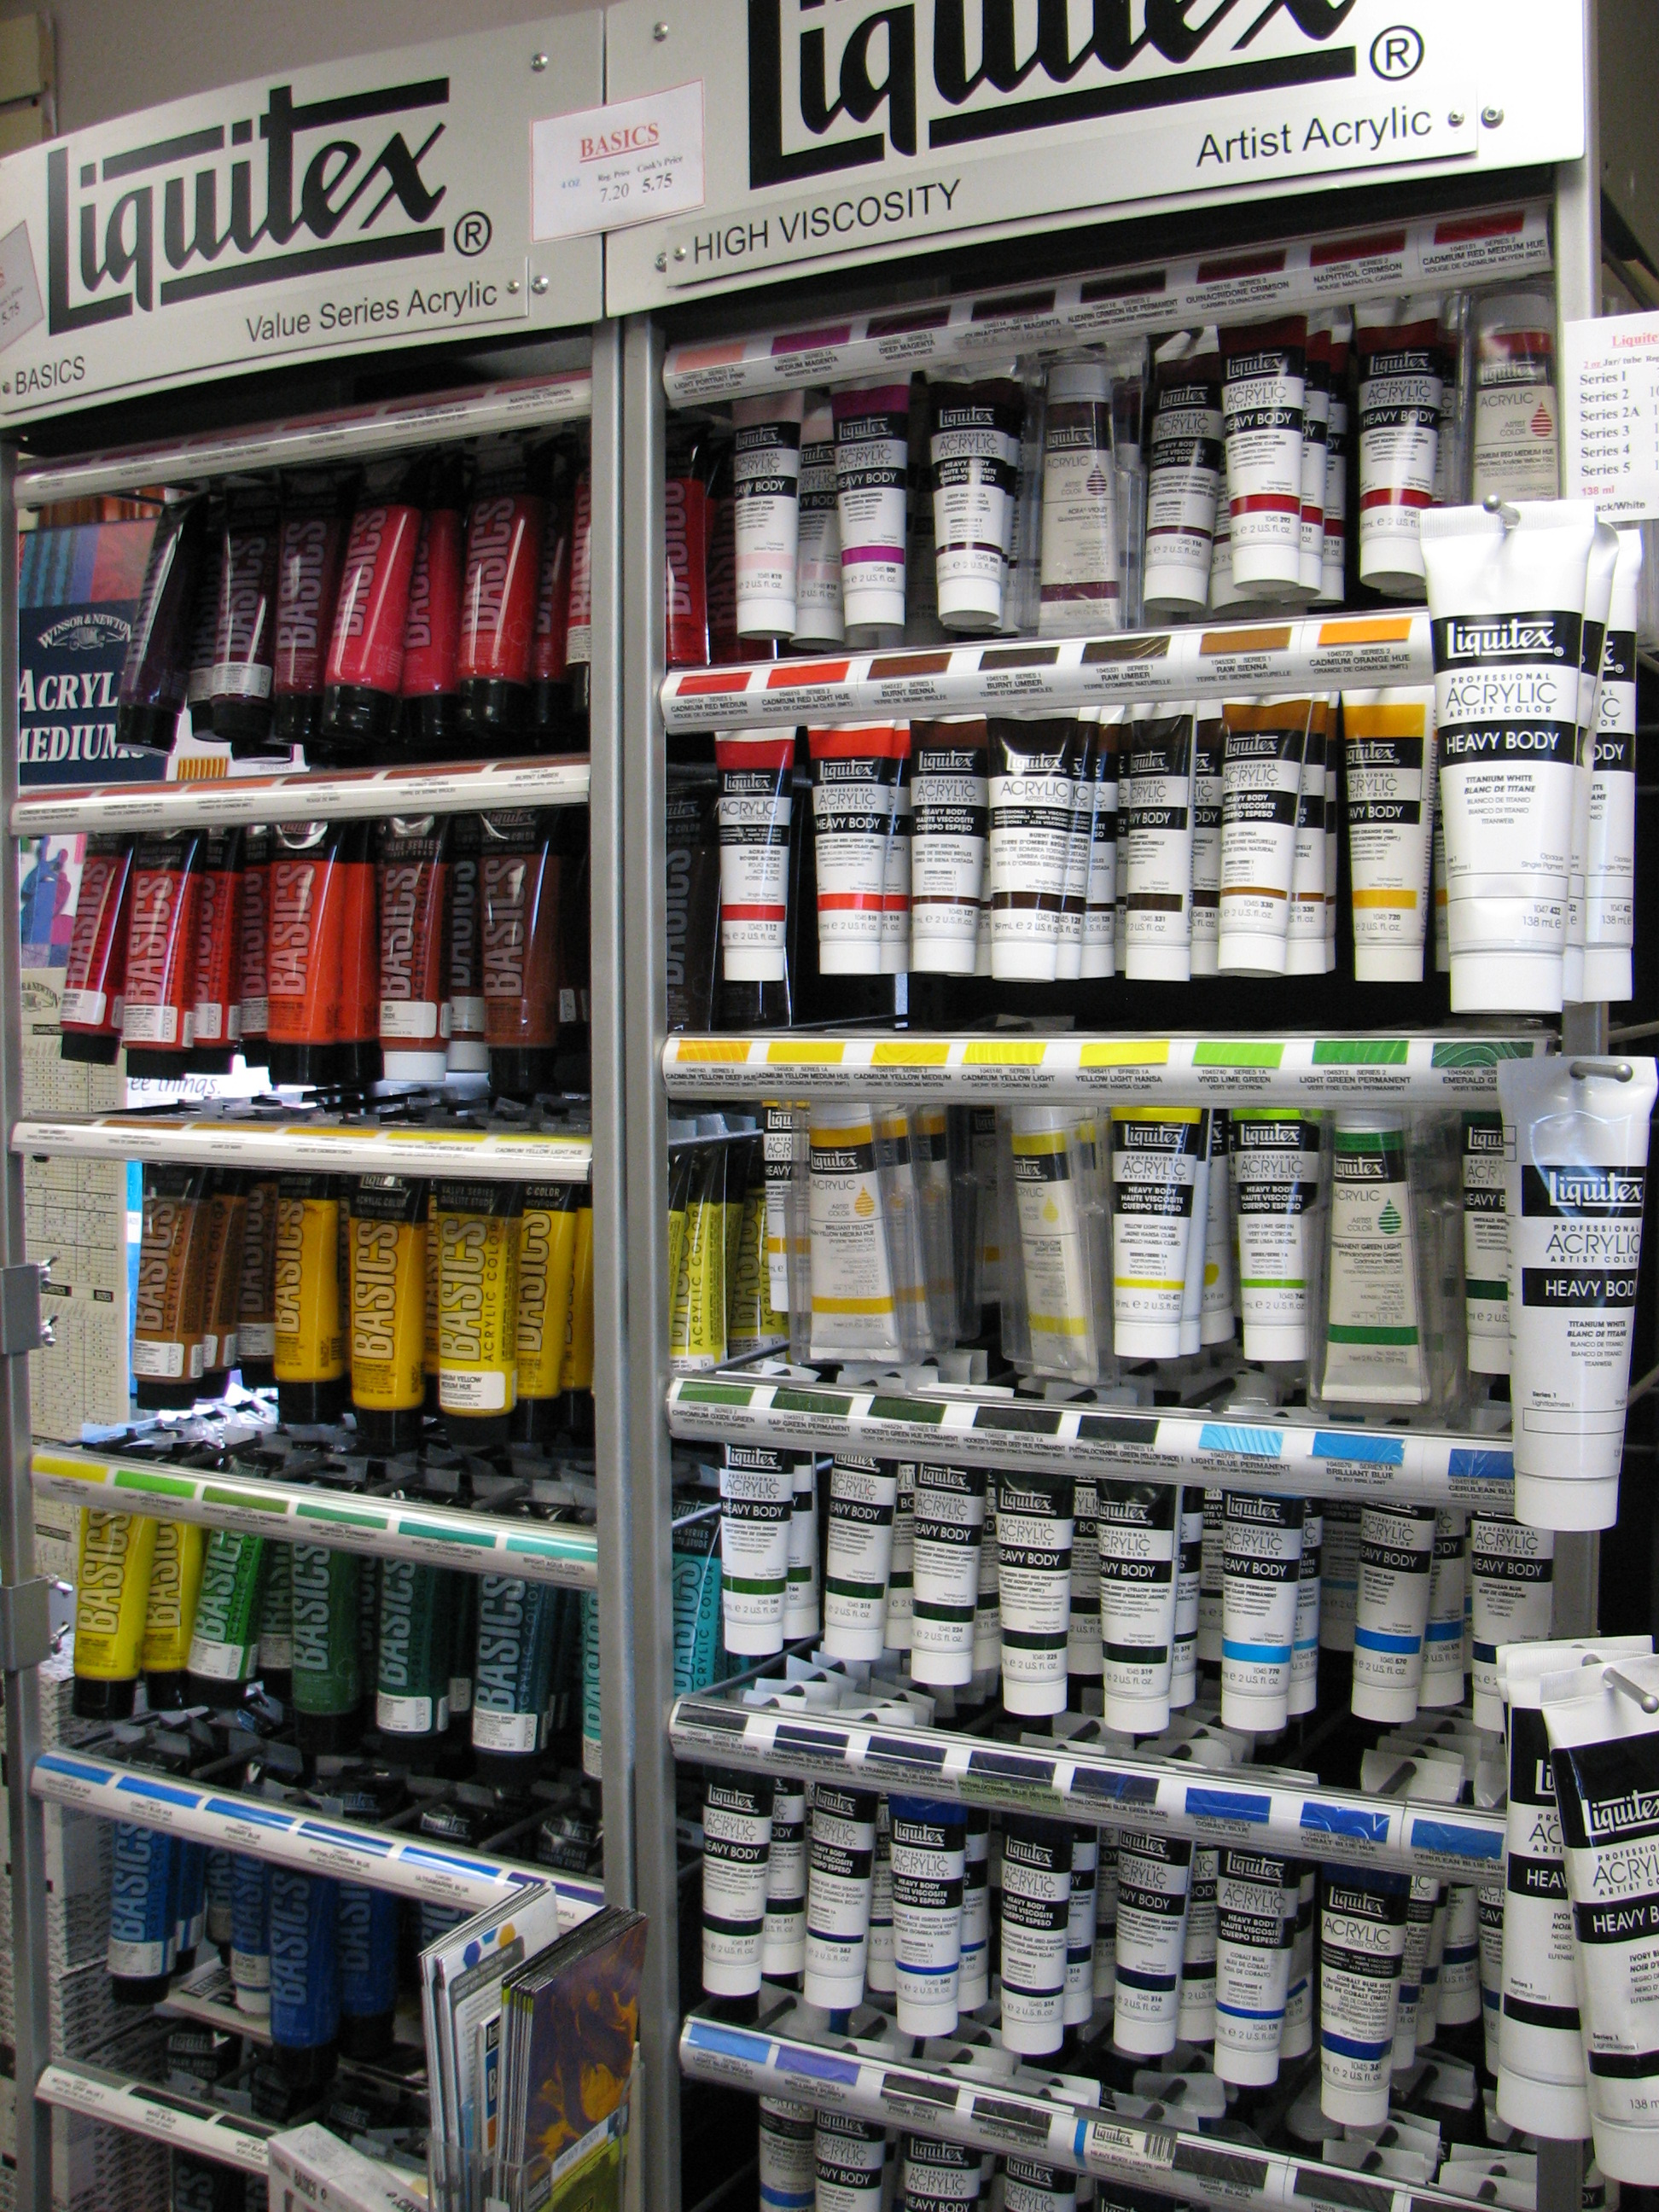 Liquitex acrylics in tubes